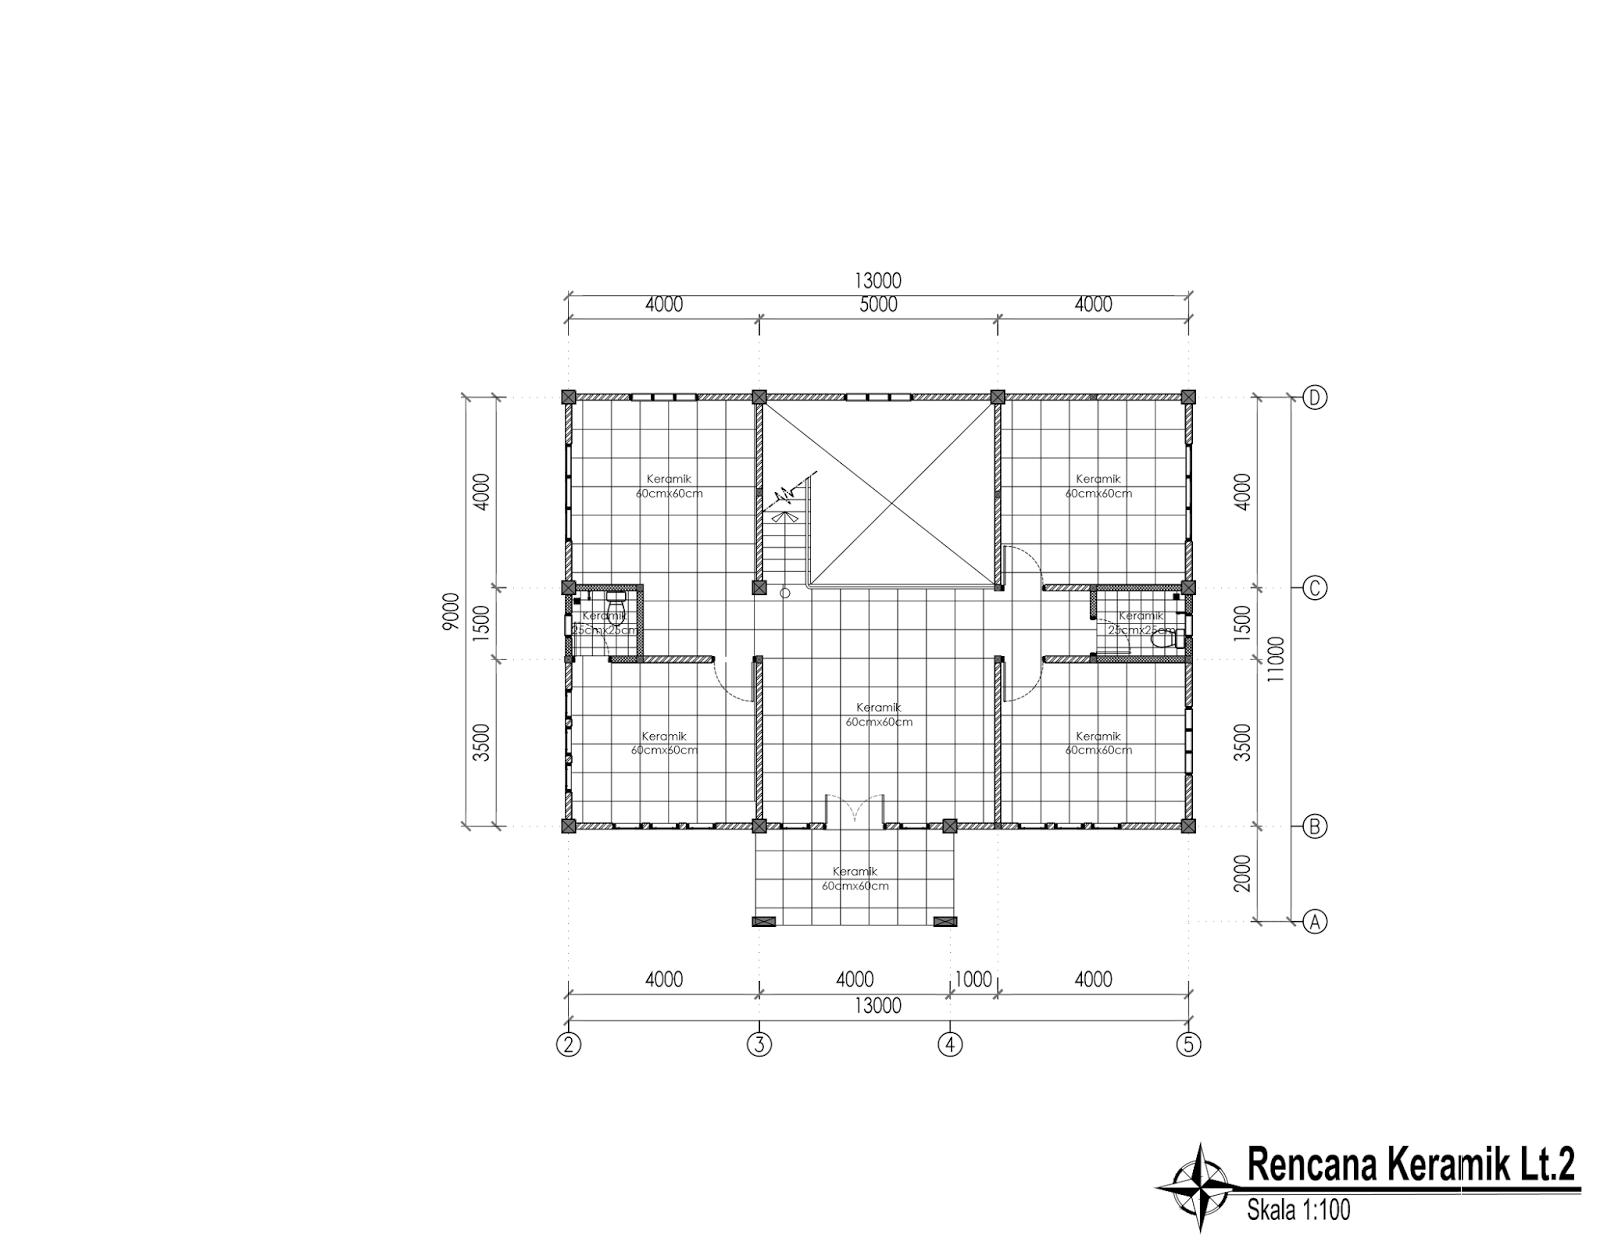 Contoh Gambar Kerja Lengkap Rumah Besar 2 Lantai Di